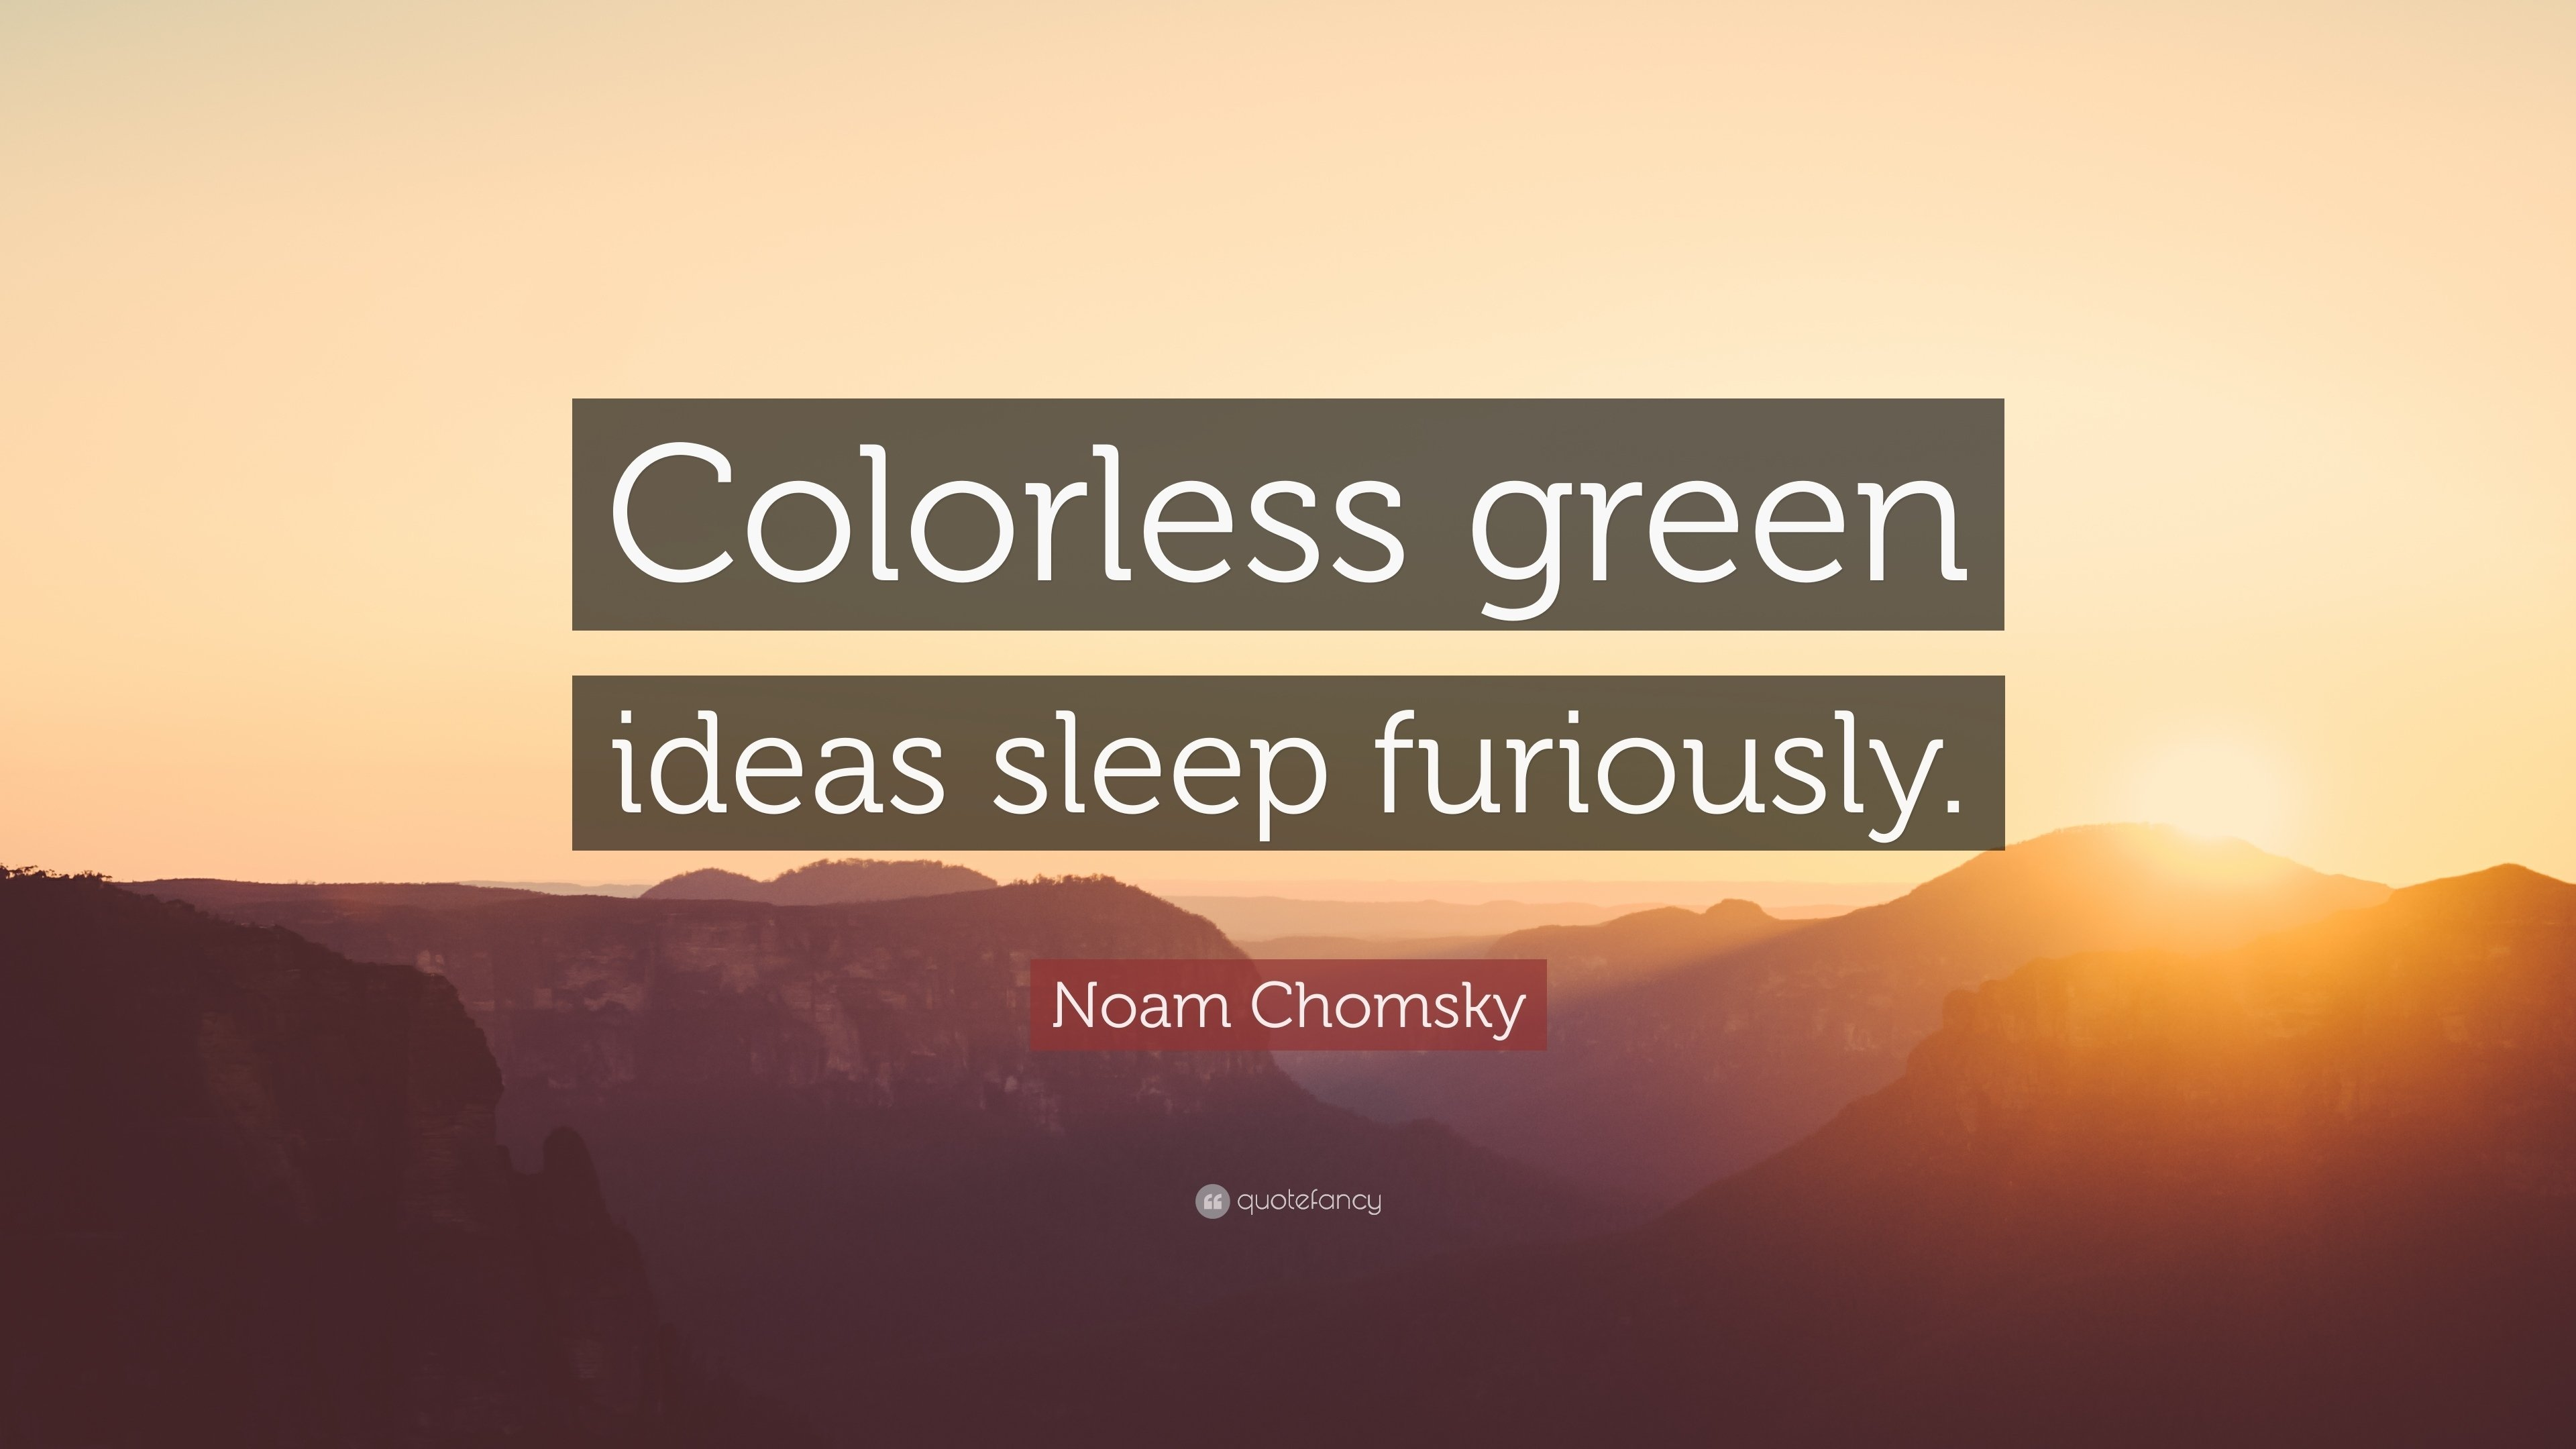 10 Gorgeous Colorless Green Ideas Sleep Furiously noam chomsky quote colorless green ideas sleep furiously 12 1 2020